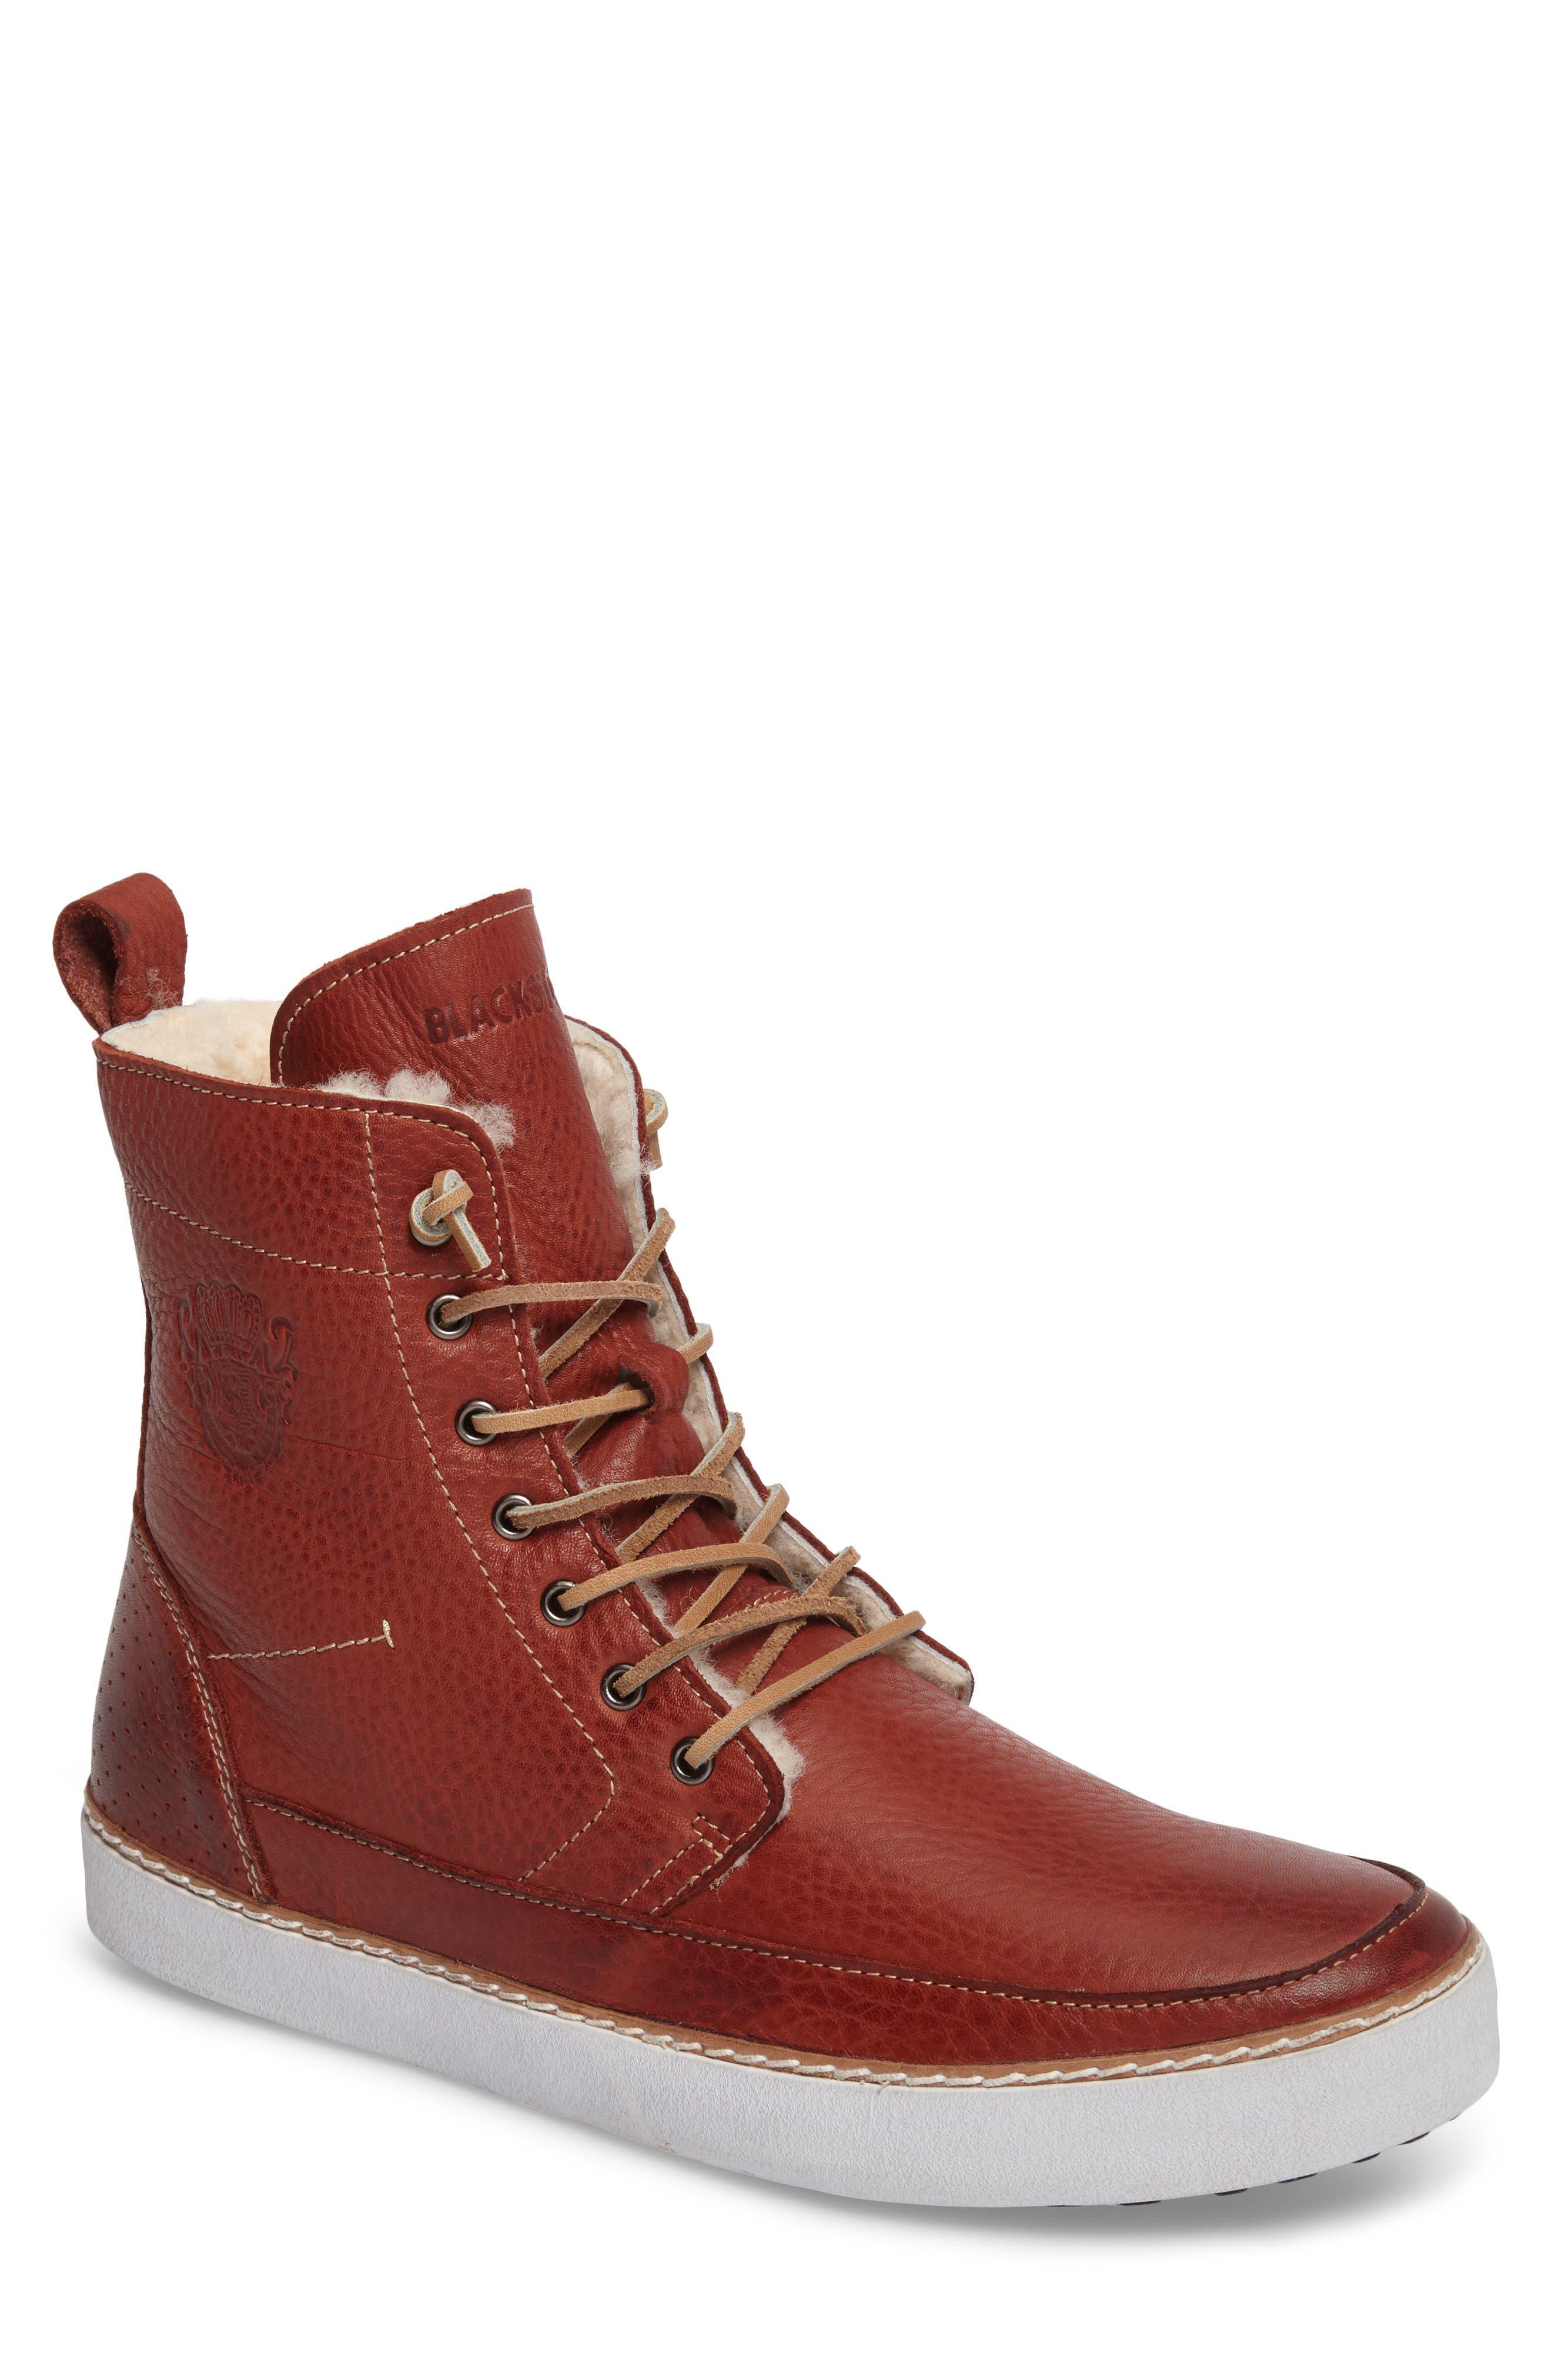 BLACKSTONE 'AM 32' Shearling Lined Boot, Main, color, 200